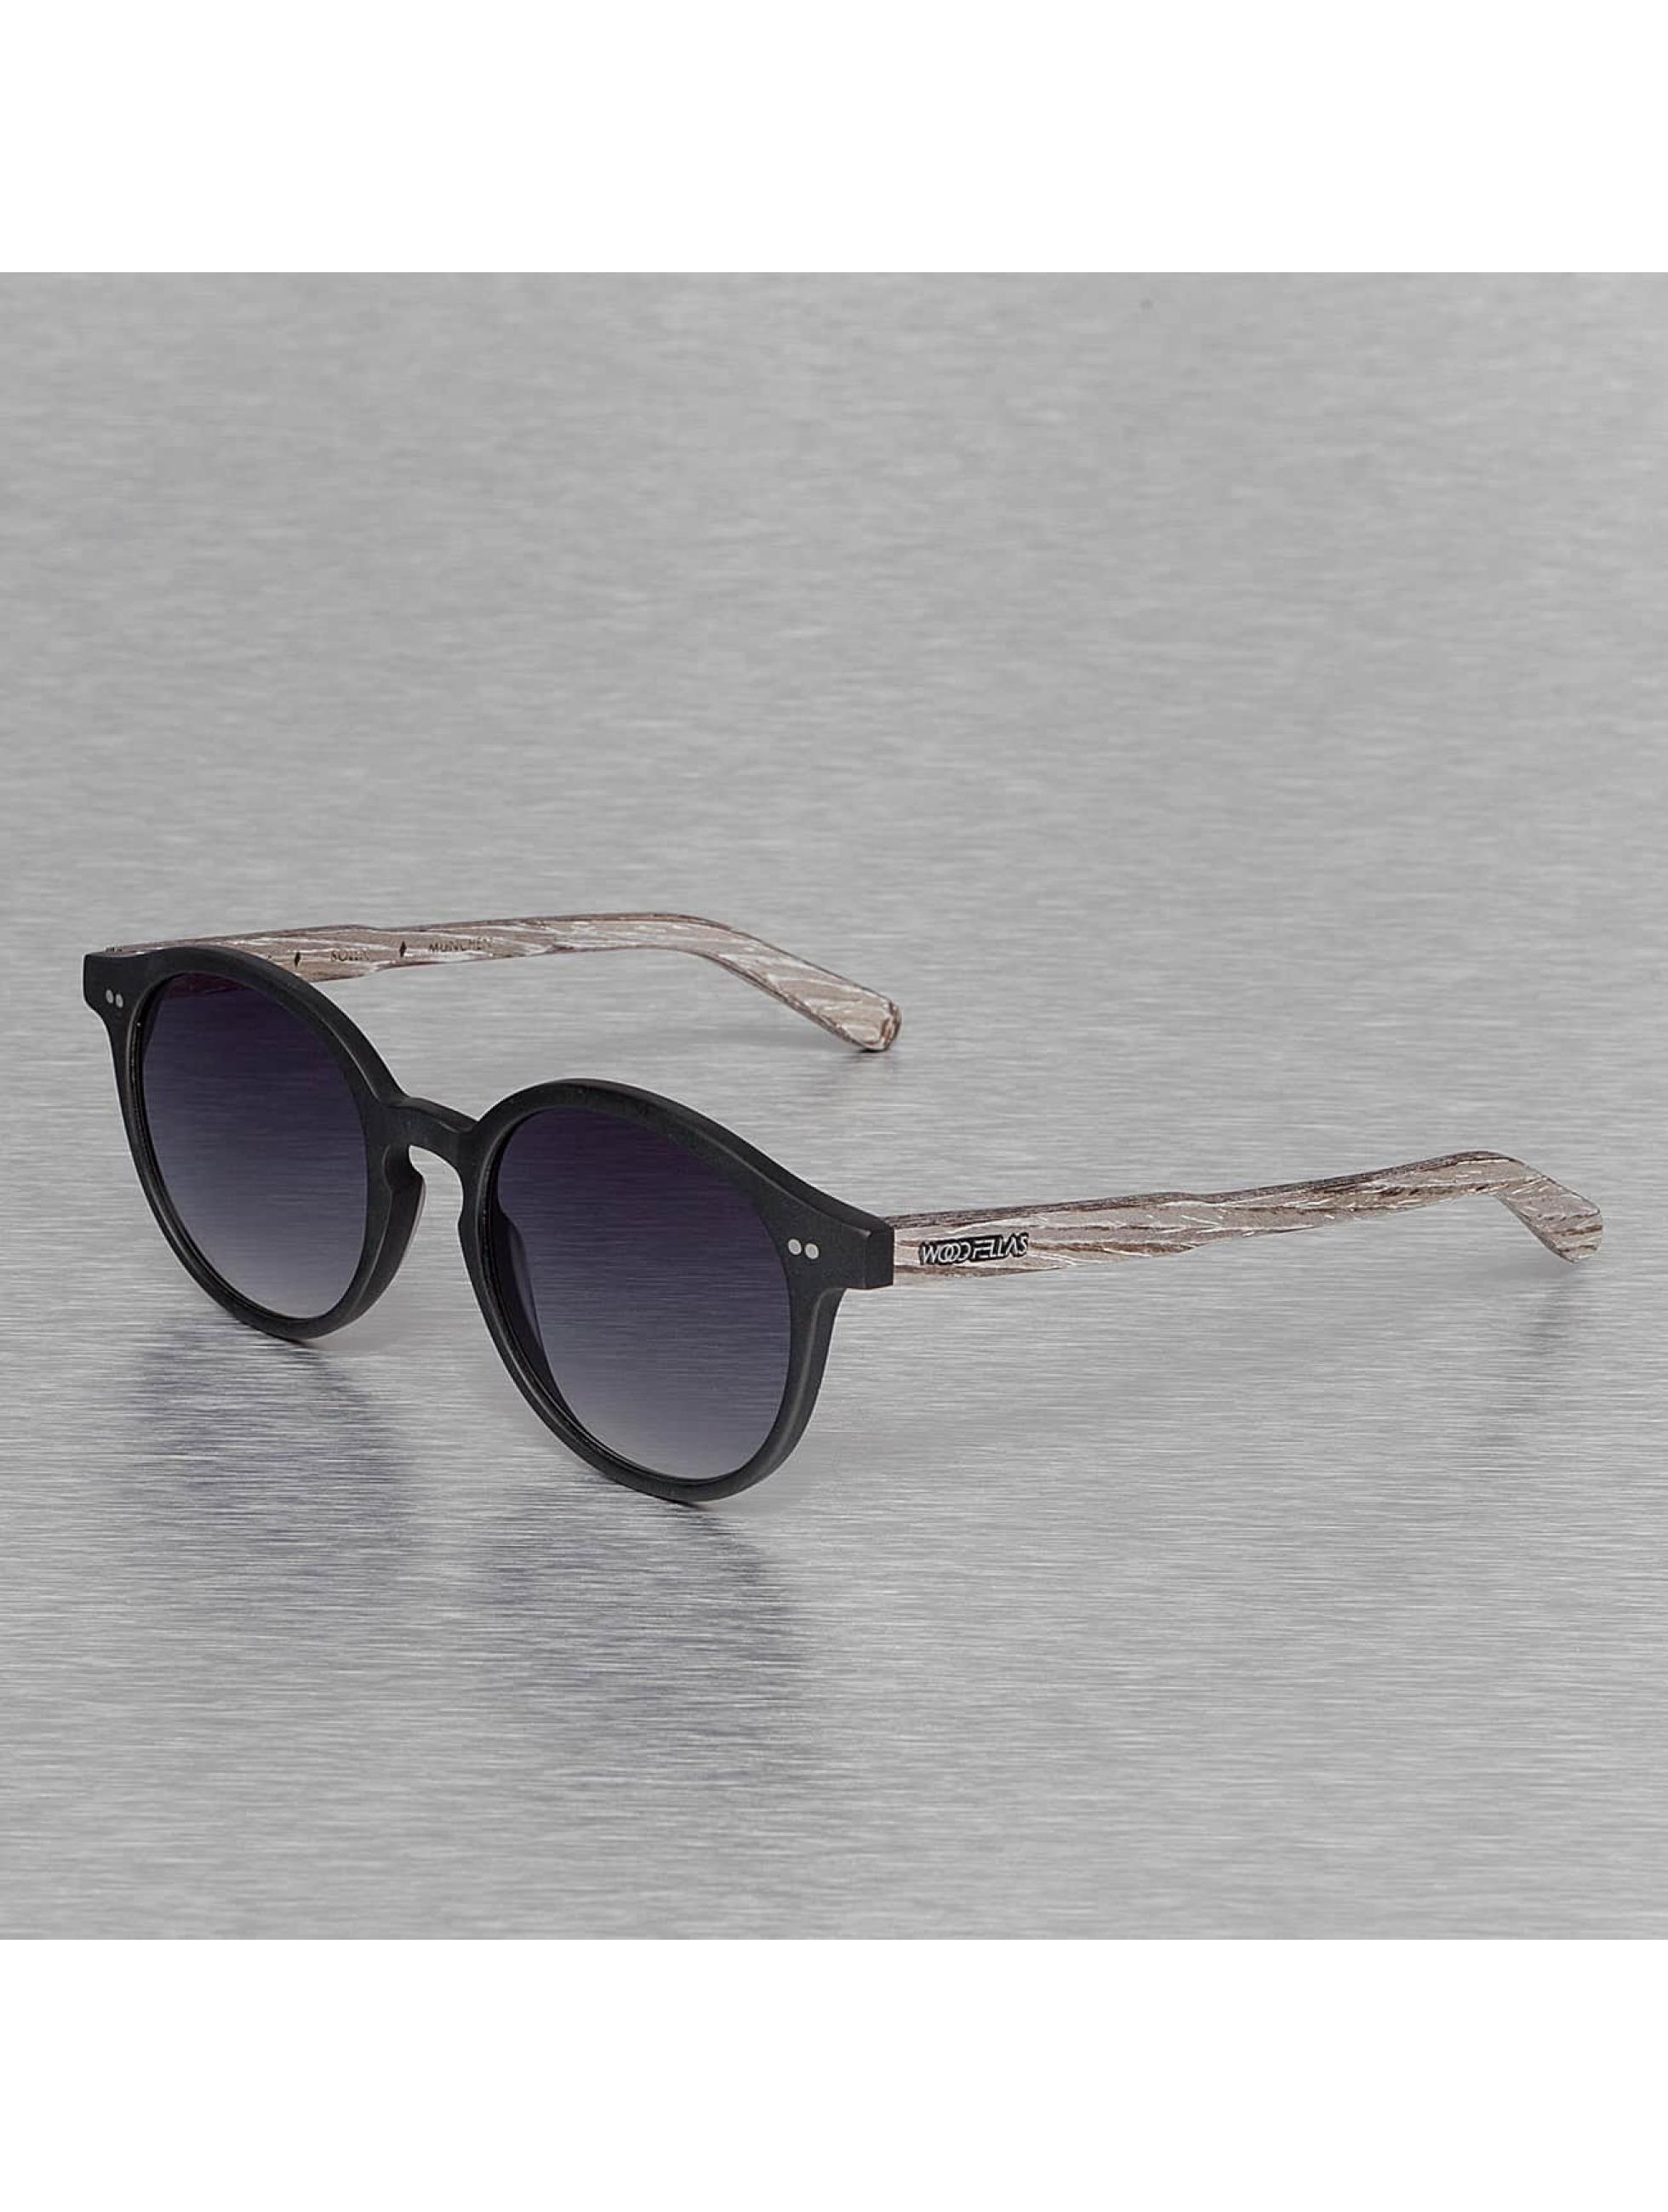 Wood Fellas Eyewear Очки Eyewear Solln Polarized Mirror черный